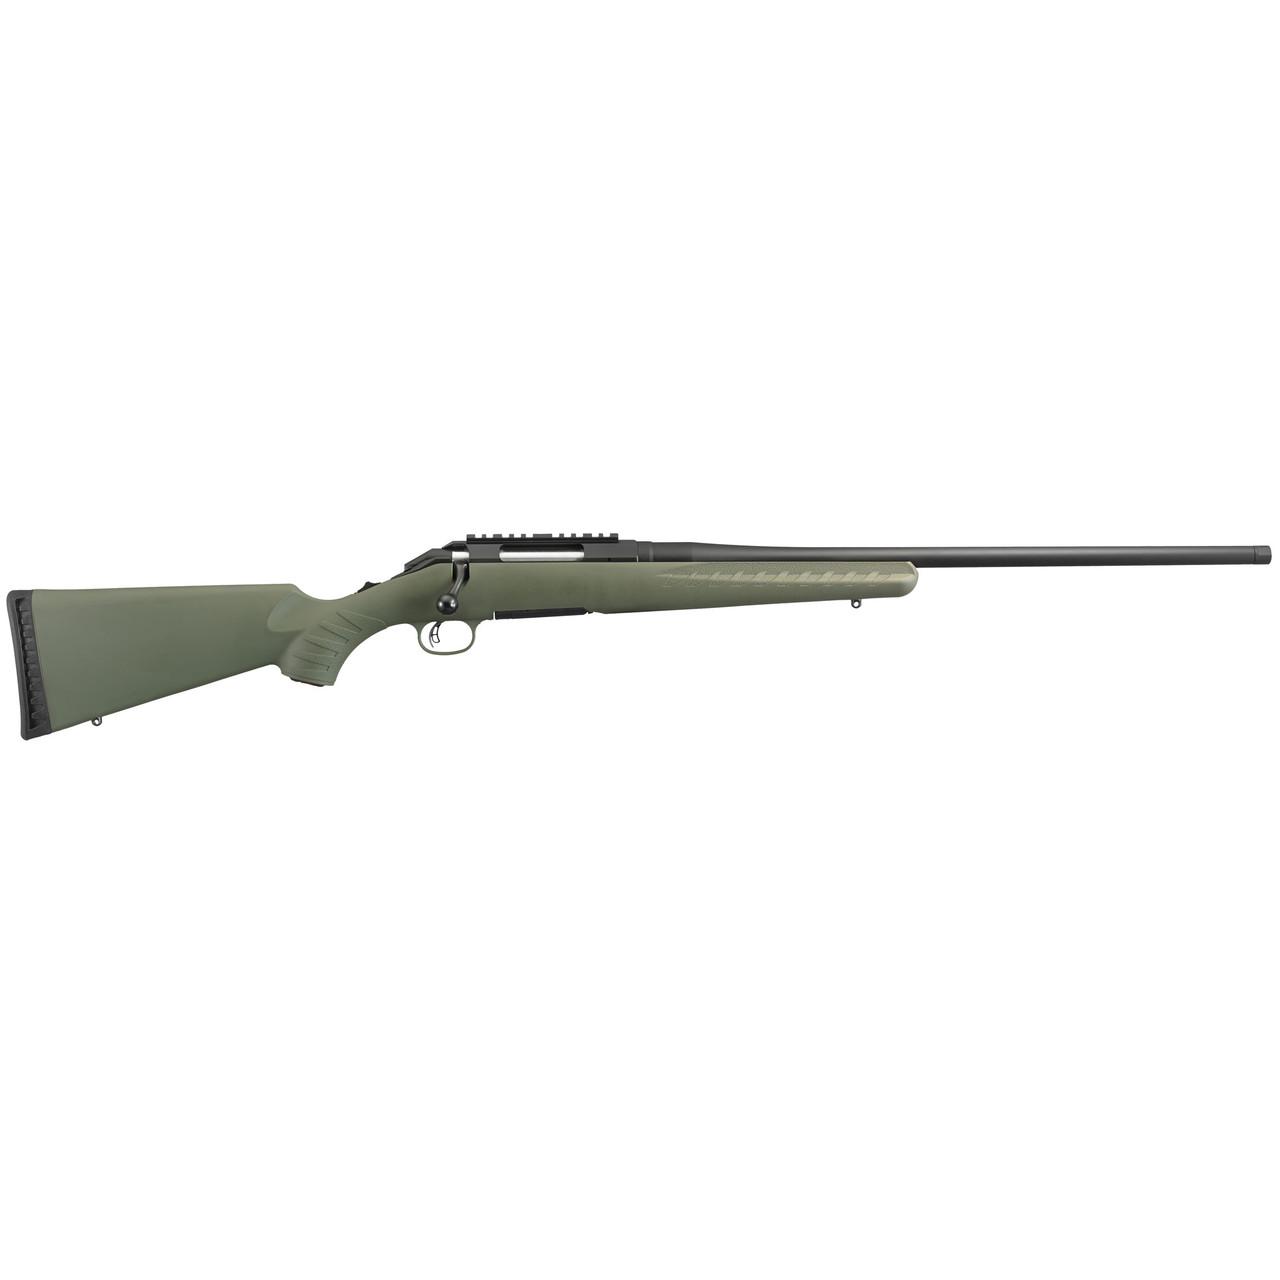 Ruger American Predator CALIFORNIA LEGAL - .308/7.62x51 - Moss Green